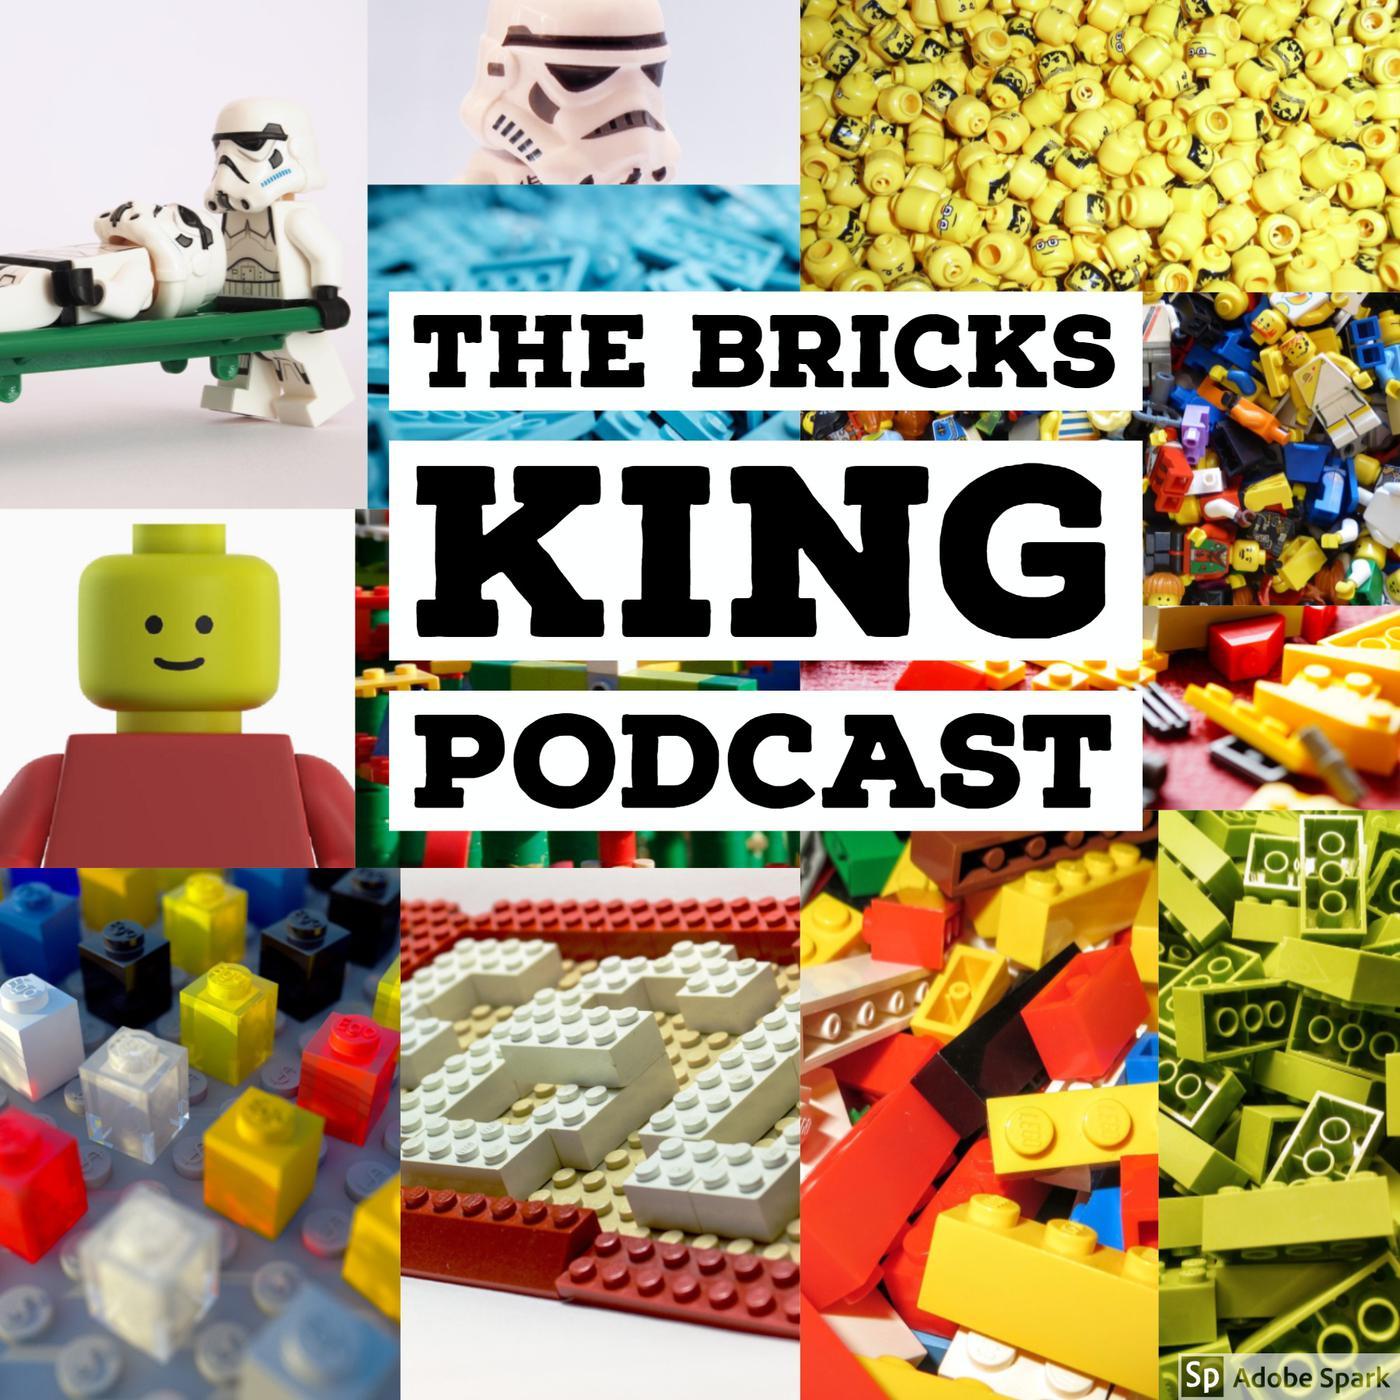 The Bricks King Podcast Lego Matt King Listen Notes